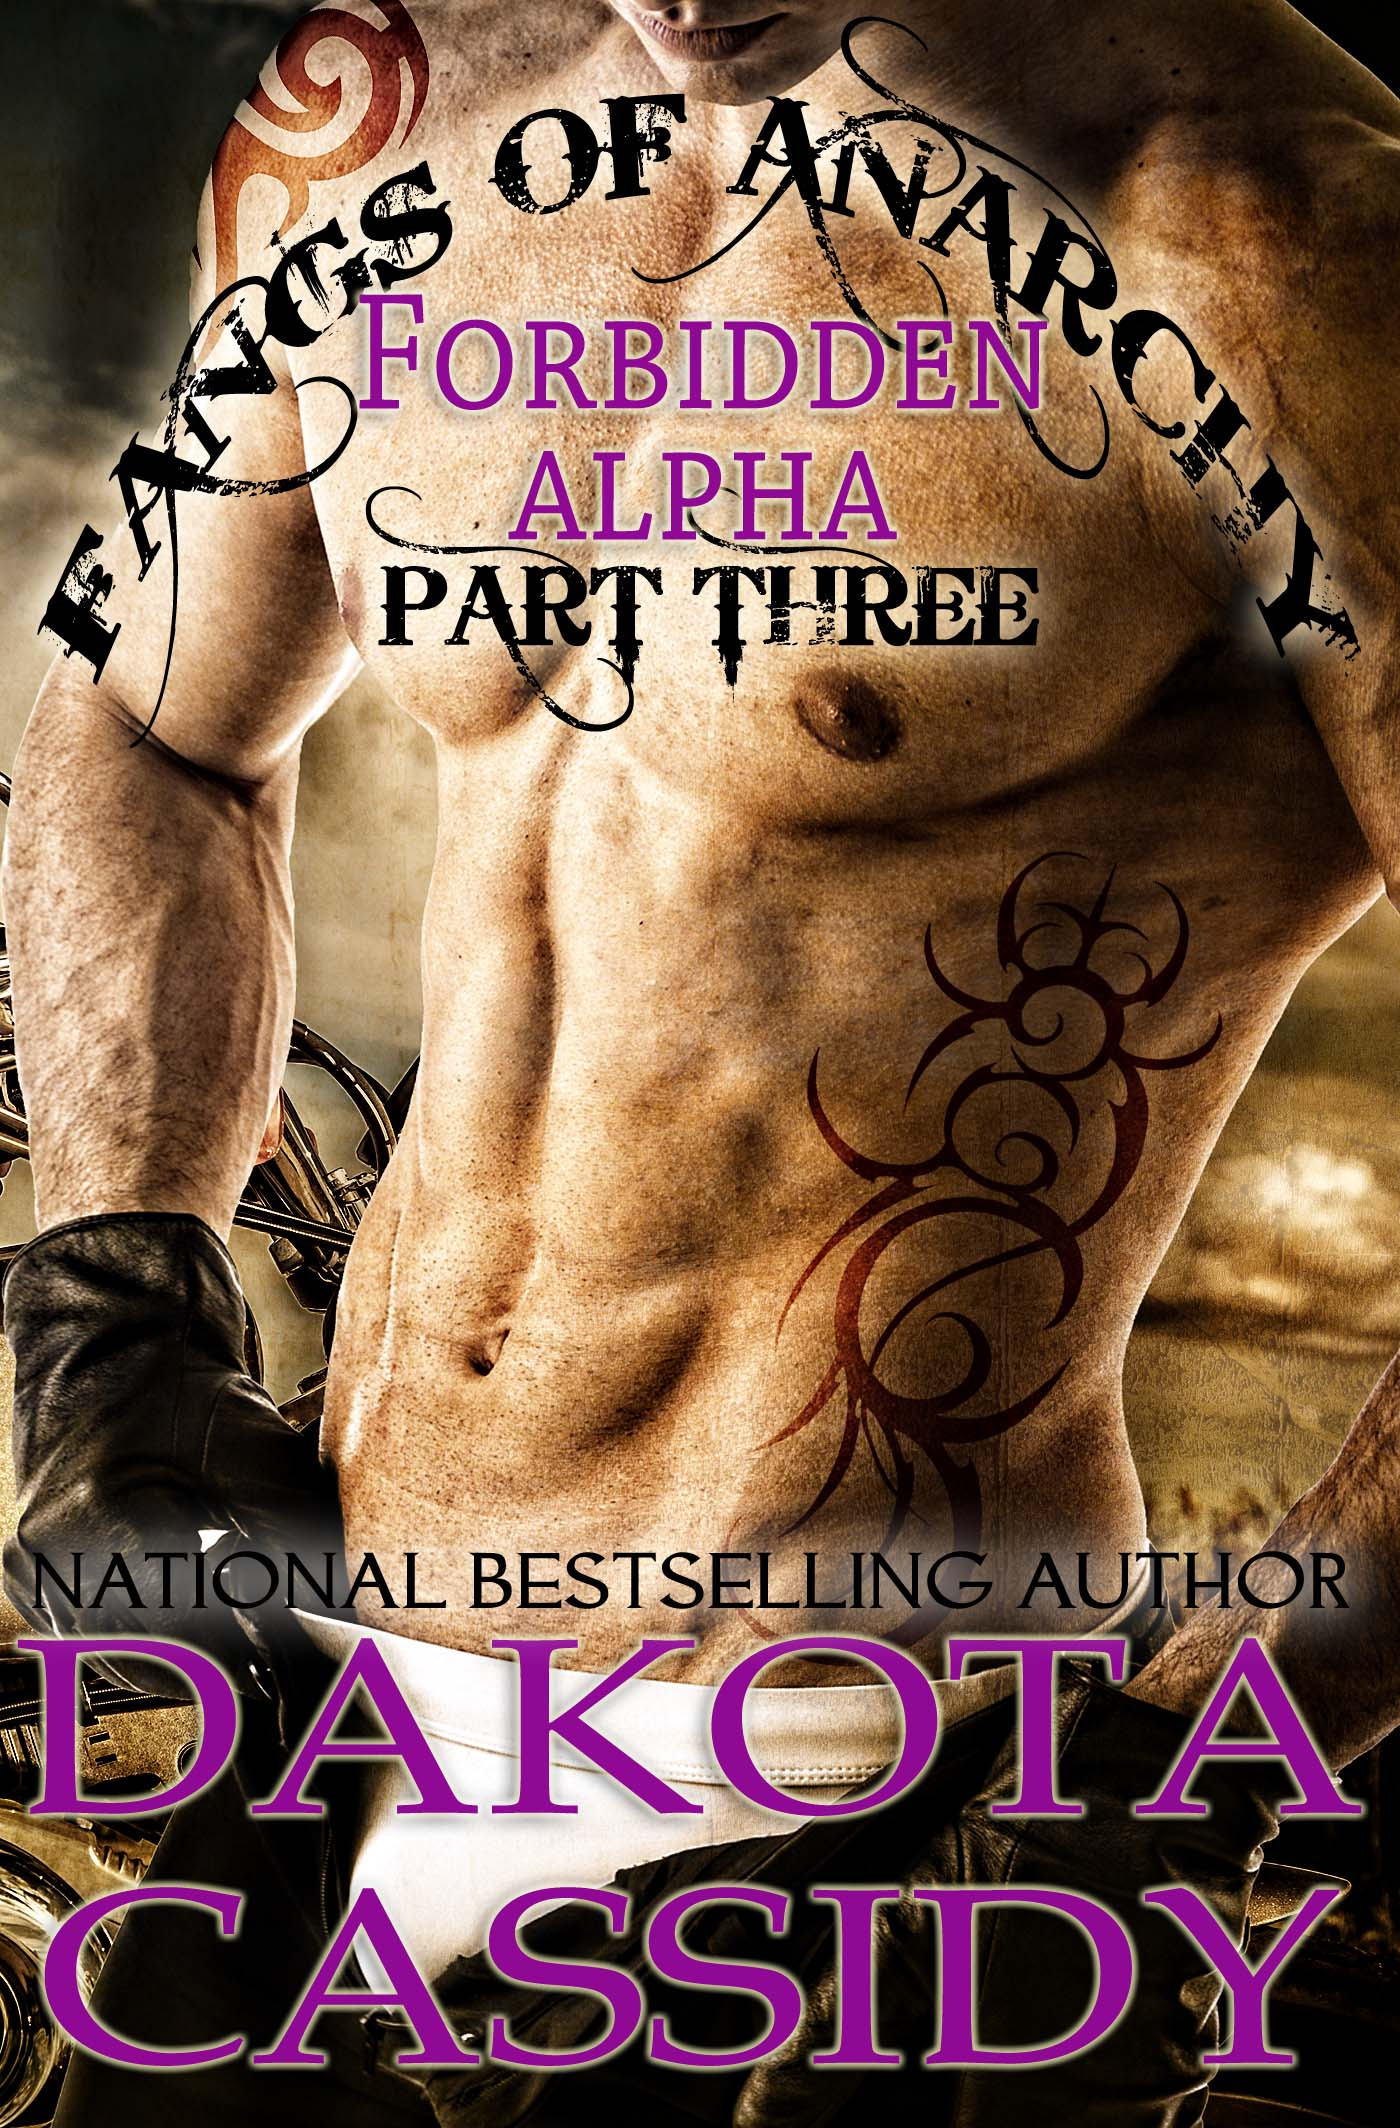 Dakota Cassidy - Fangs of Anarchy - Forbidden Alpha (Part 3) Were in the World is Gannon Dodd?